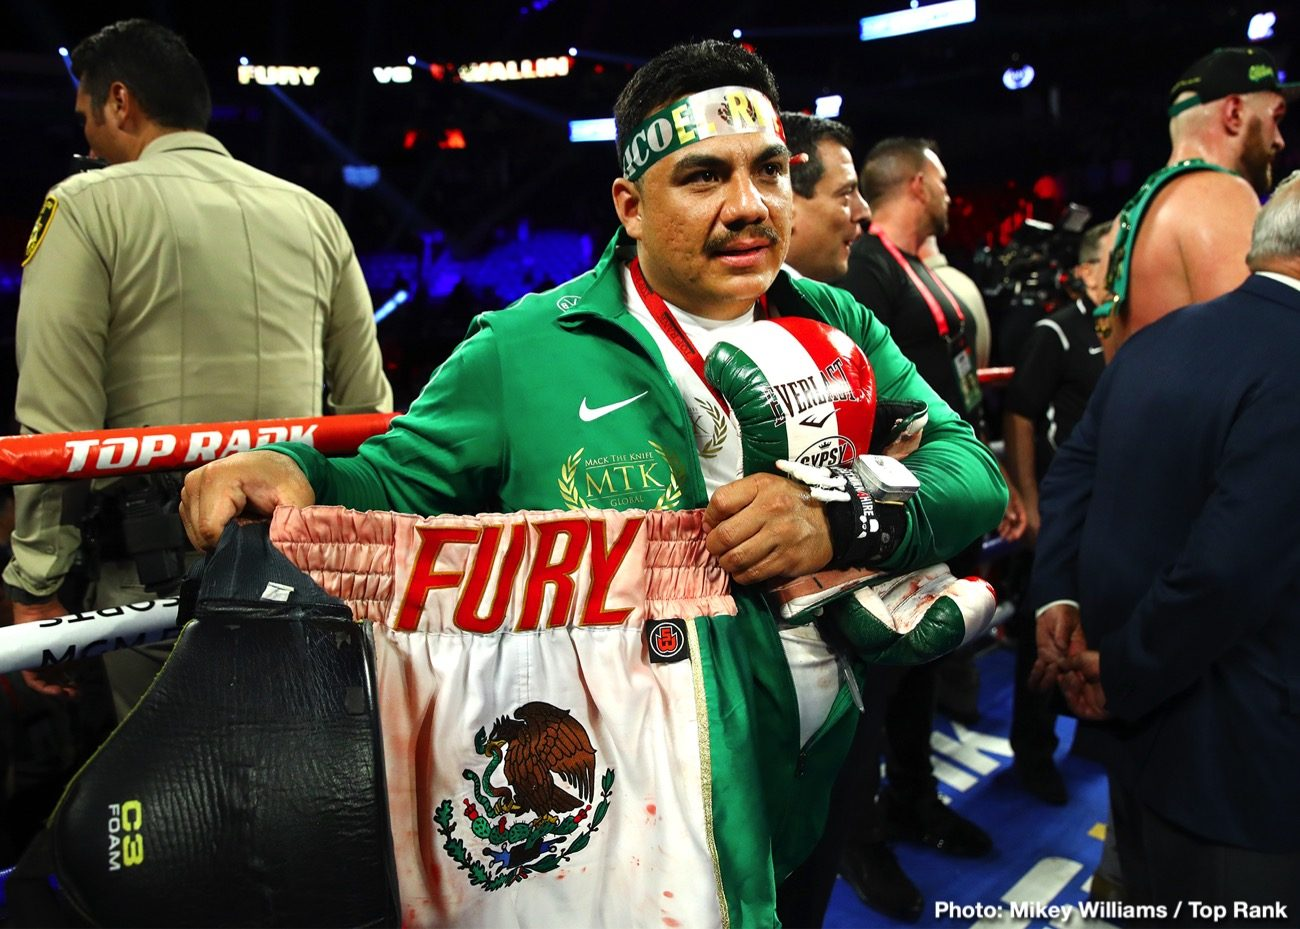 Tyson Fury ESPN Fury vs. Wallin Jorge Capetillo Otto Wallin top rank